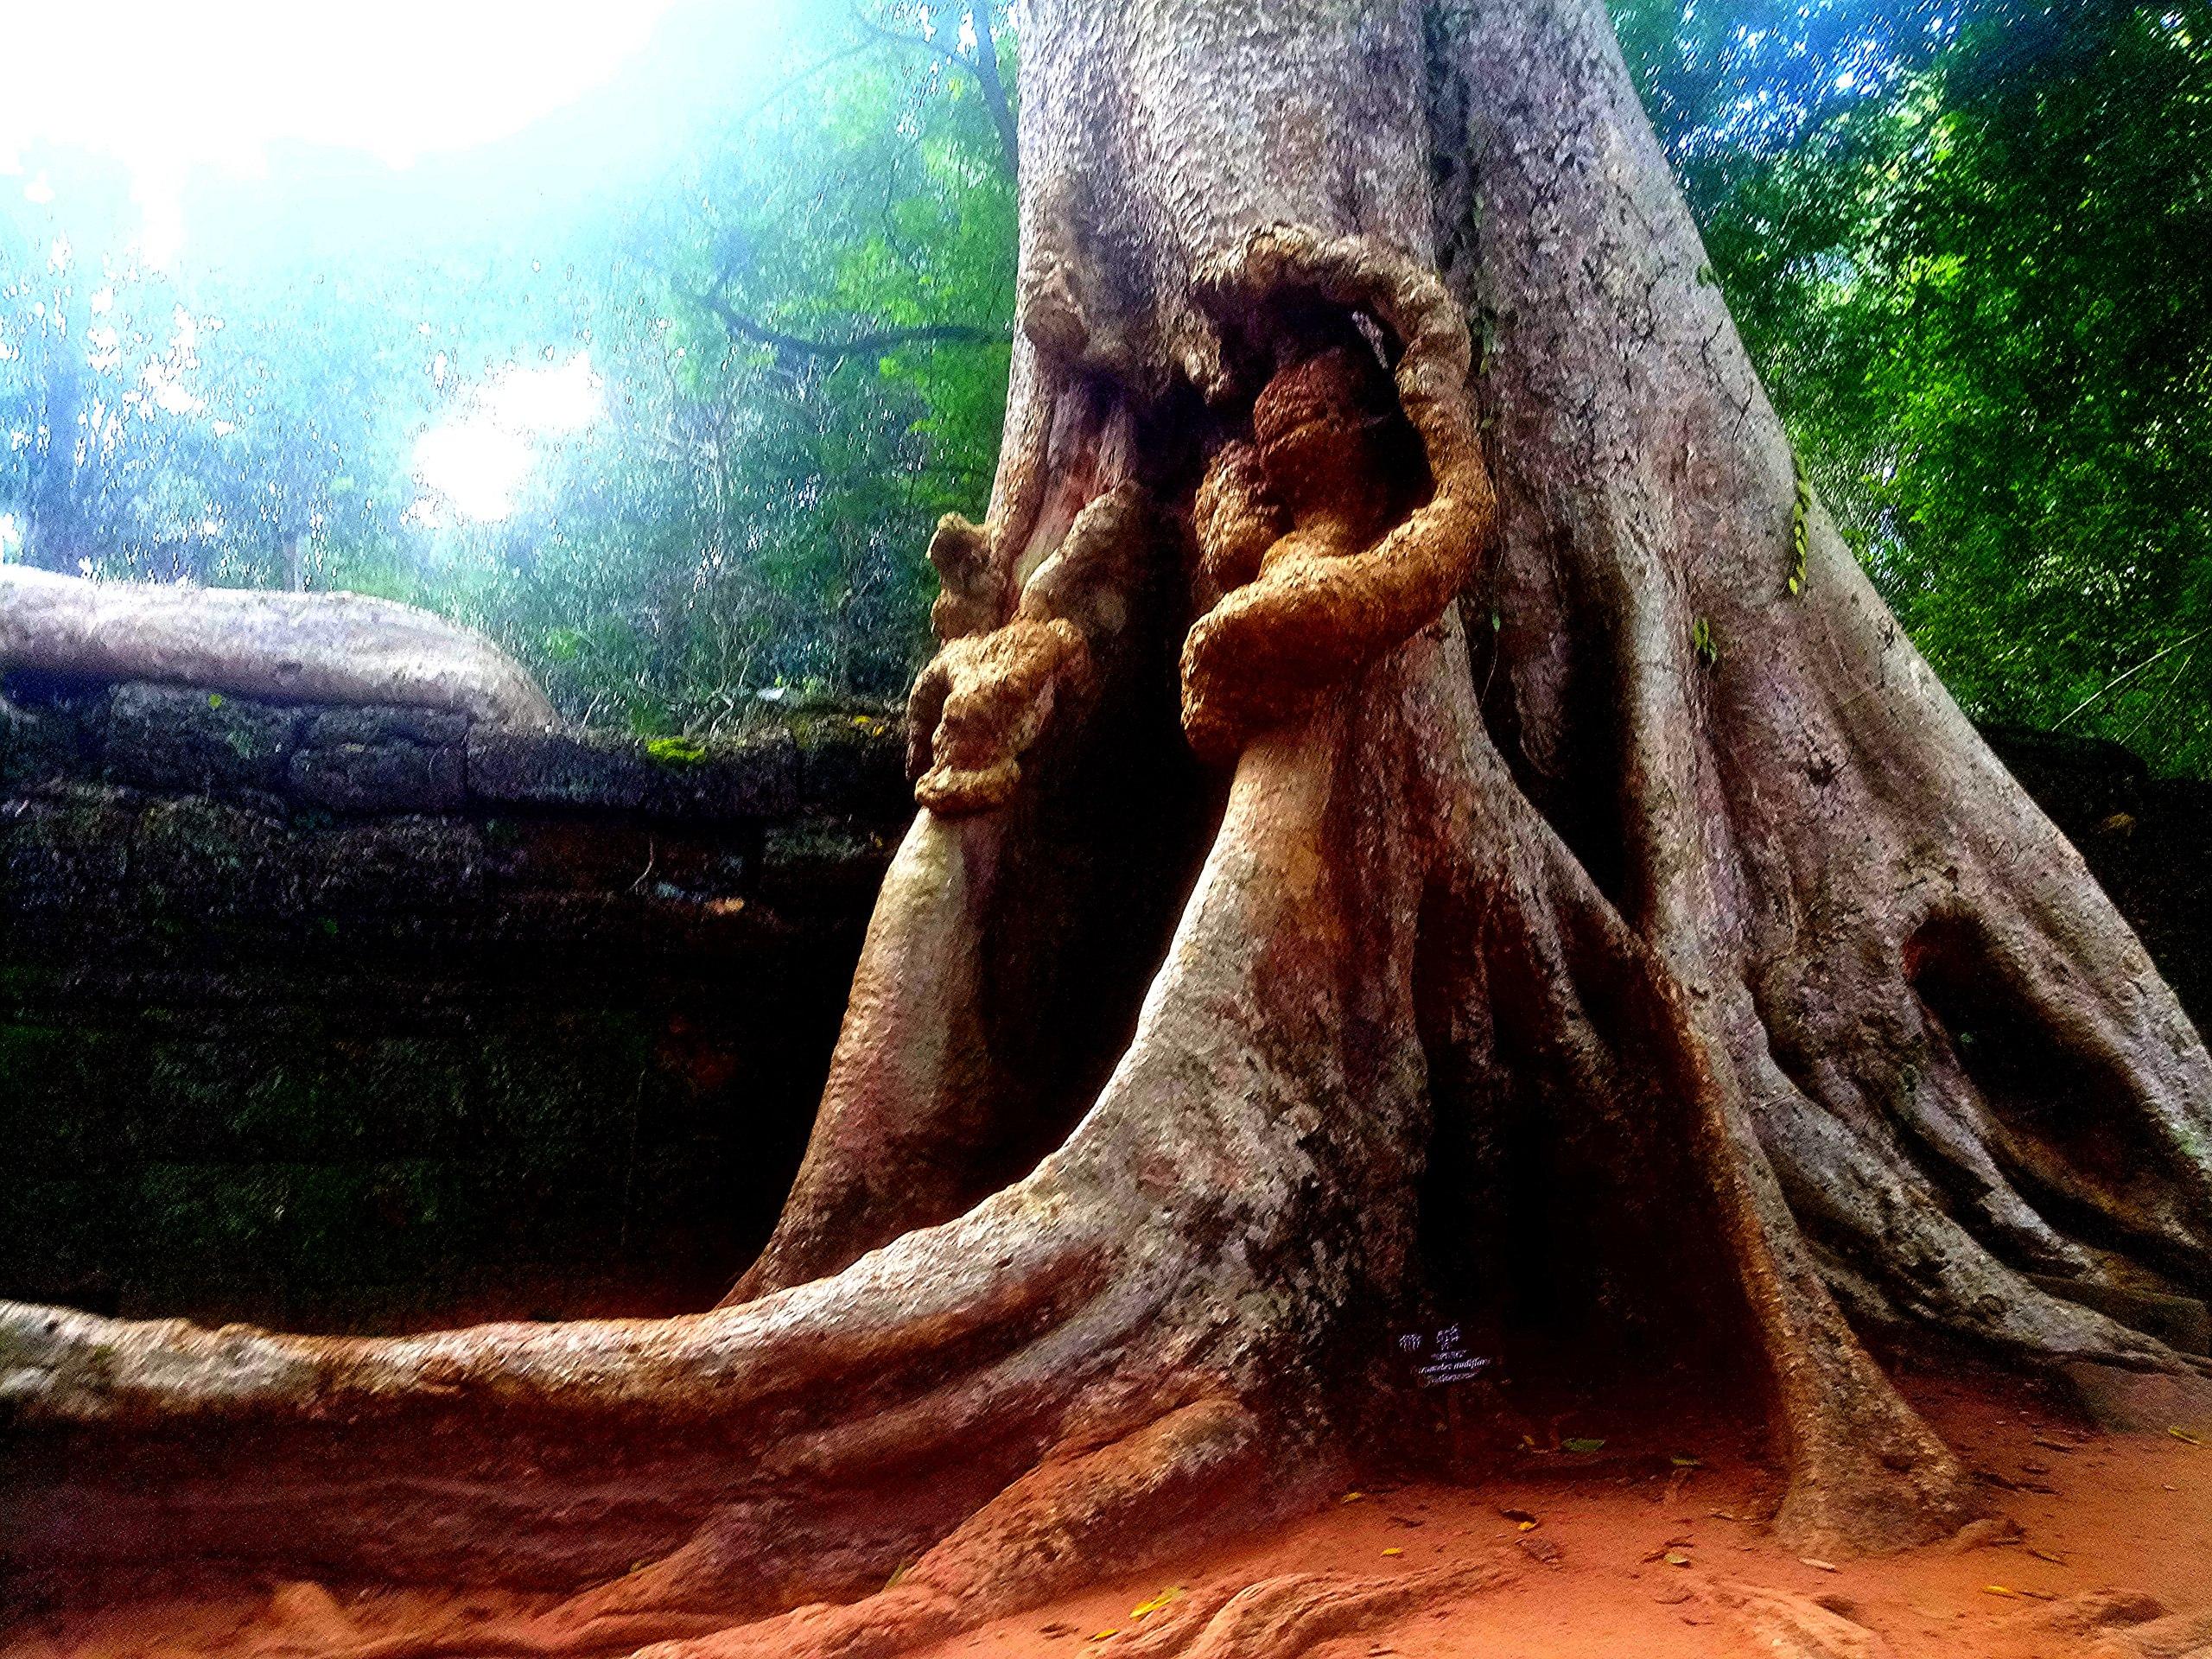 Елена Руденко (Валтея). Камбоджа. Ангкор. - Страница 3 YqR2lbJg8OM